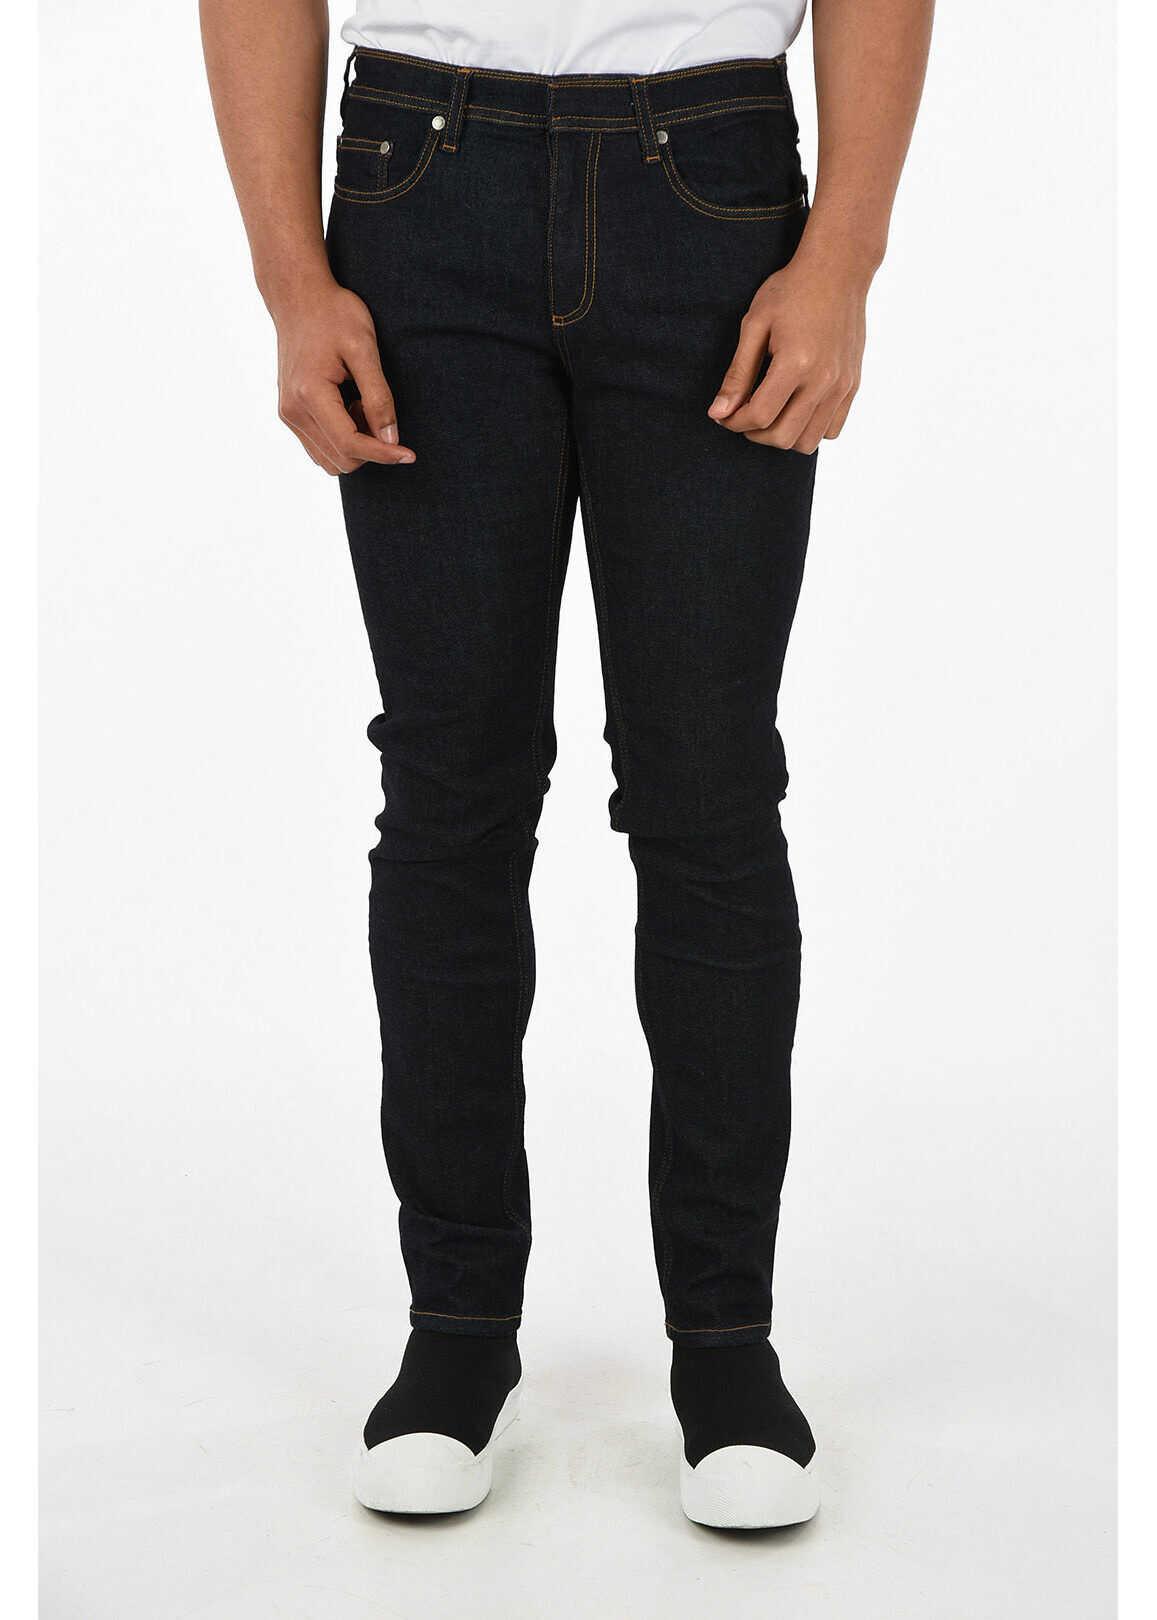 Neil Barrett 5 Pocket Skinny Fit Jeans 16 cm BLUE